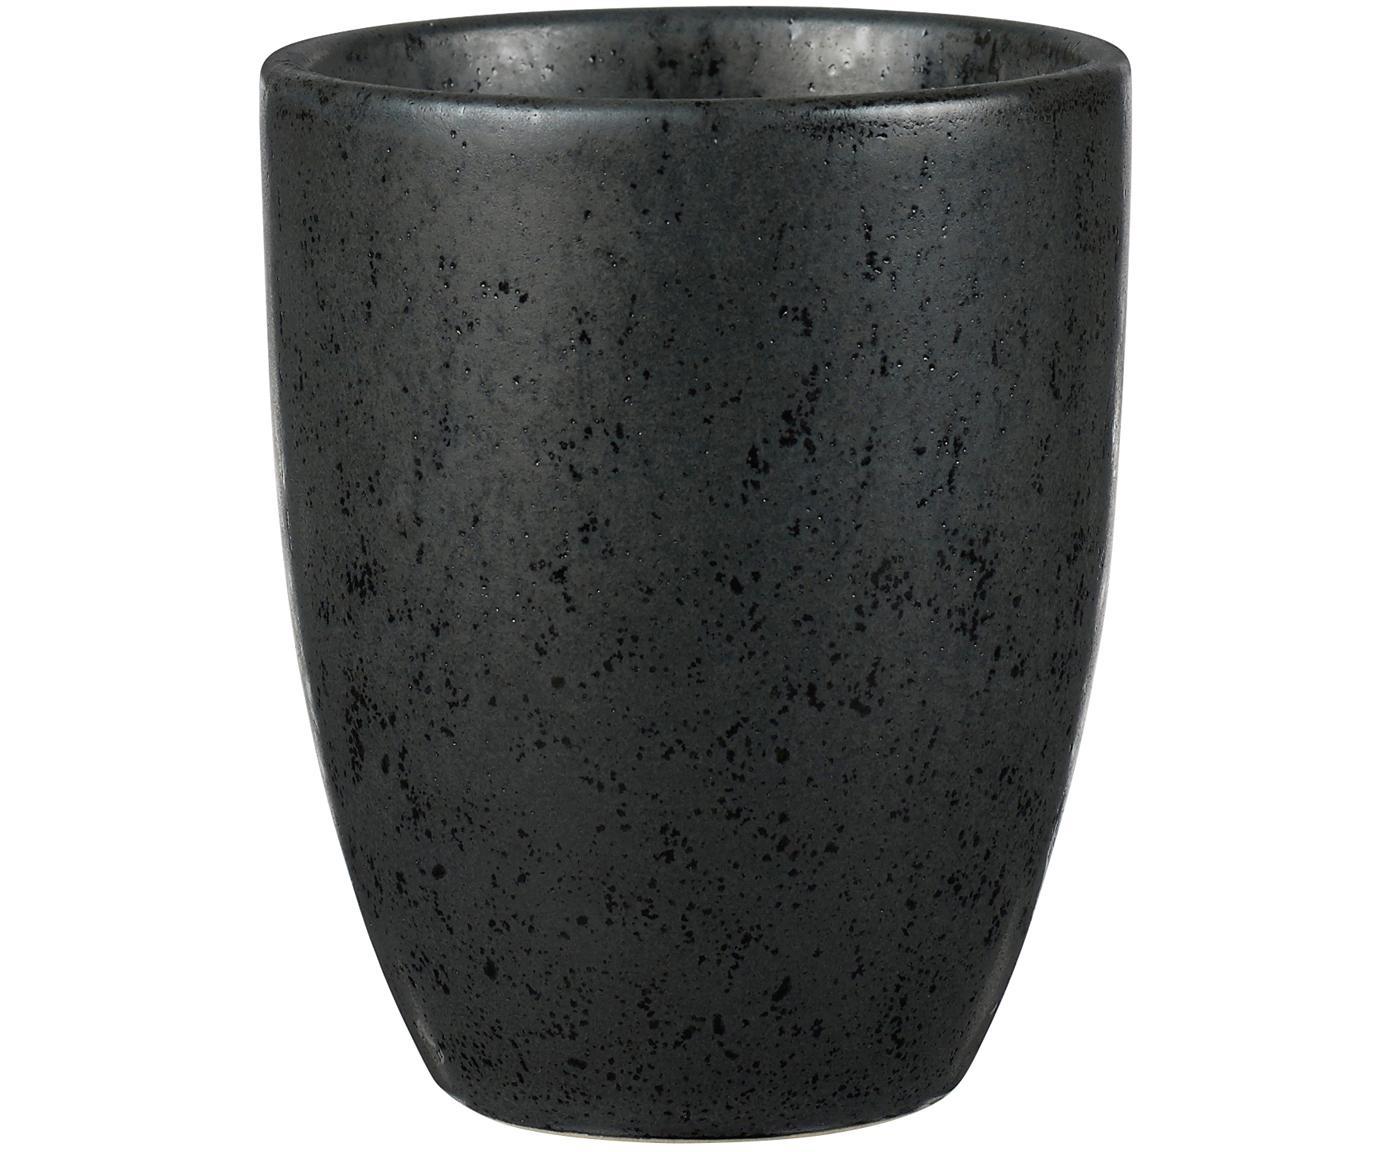 Bicchiere Stone, 2 pz., Terracotta smaltata, Nero, Ø 8 x A 10 cm